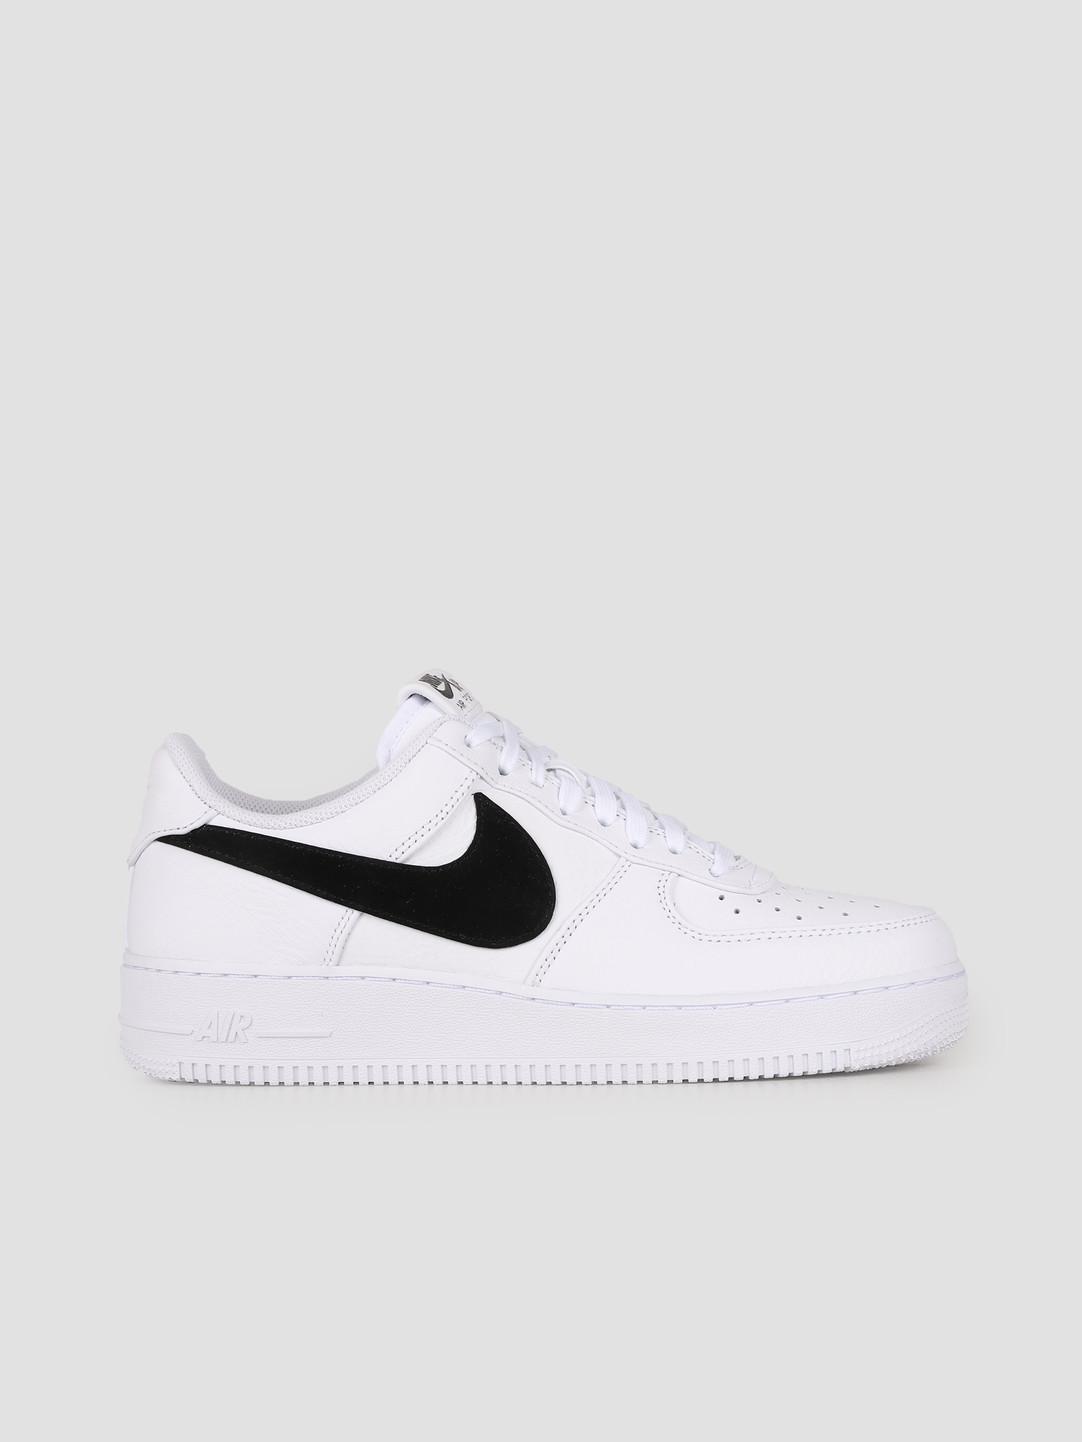 Nike Air Force 1 07 PRM 2 White Black AT4143 102